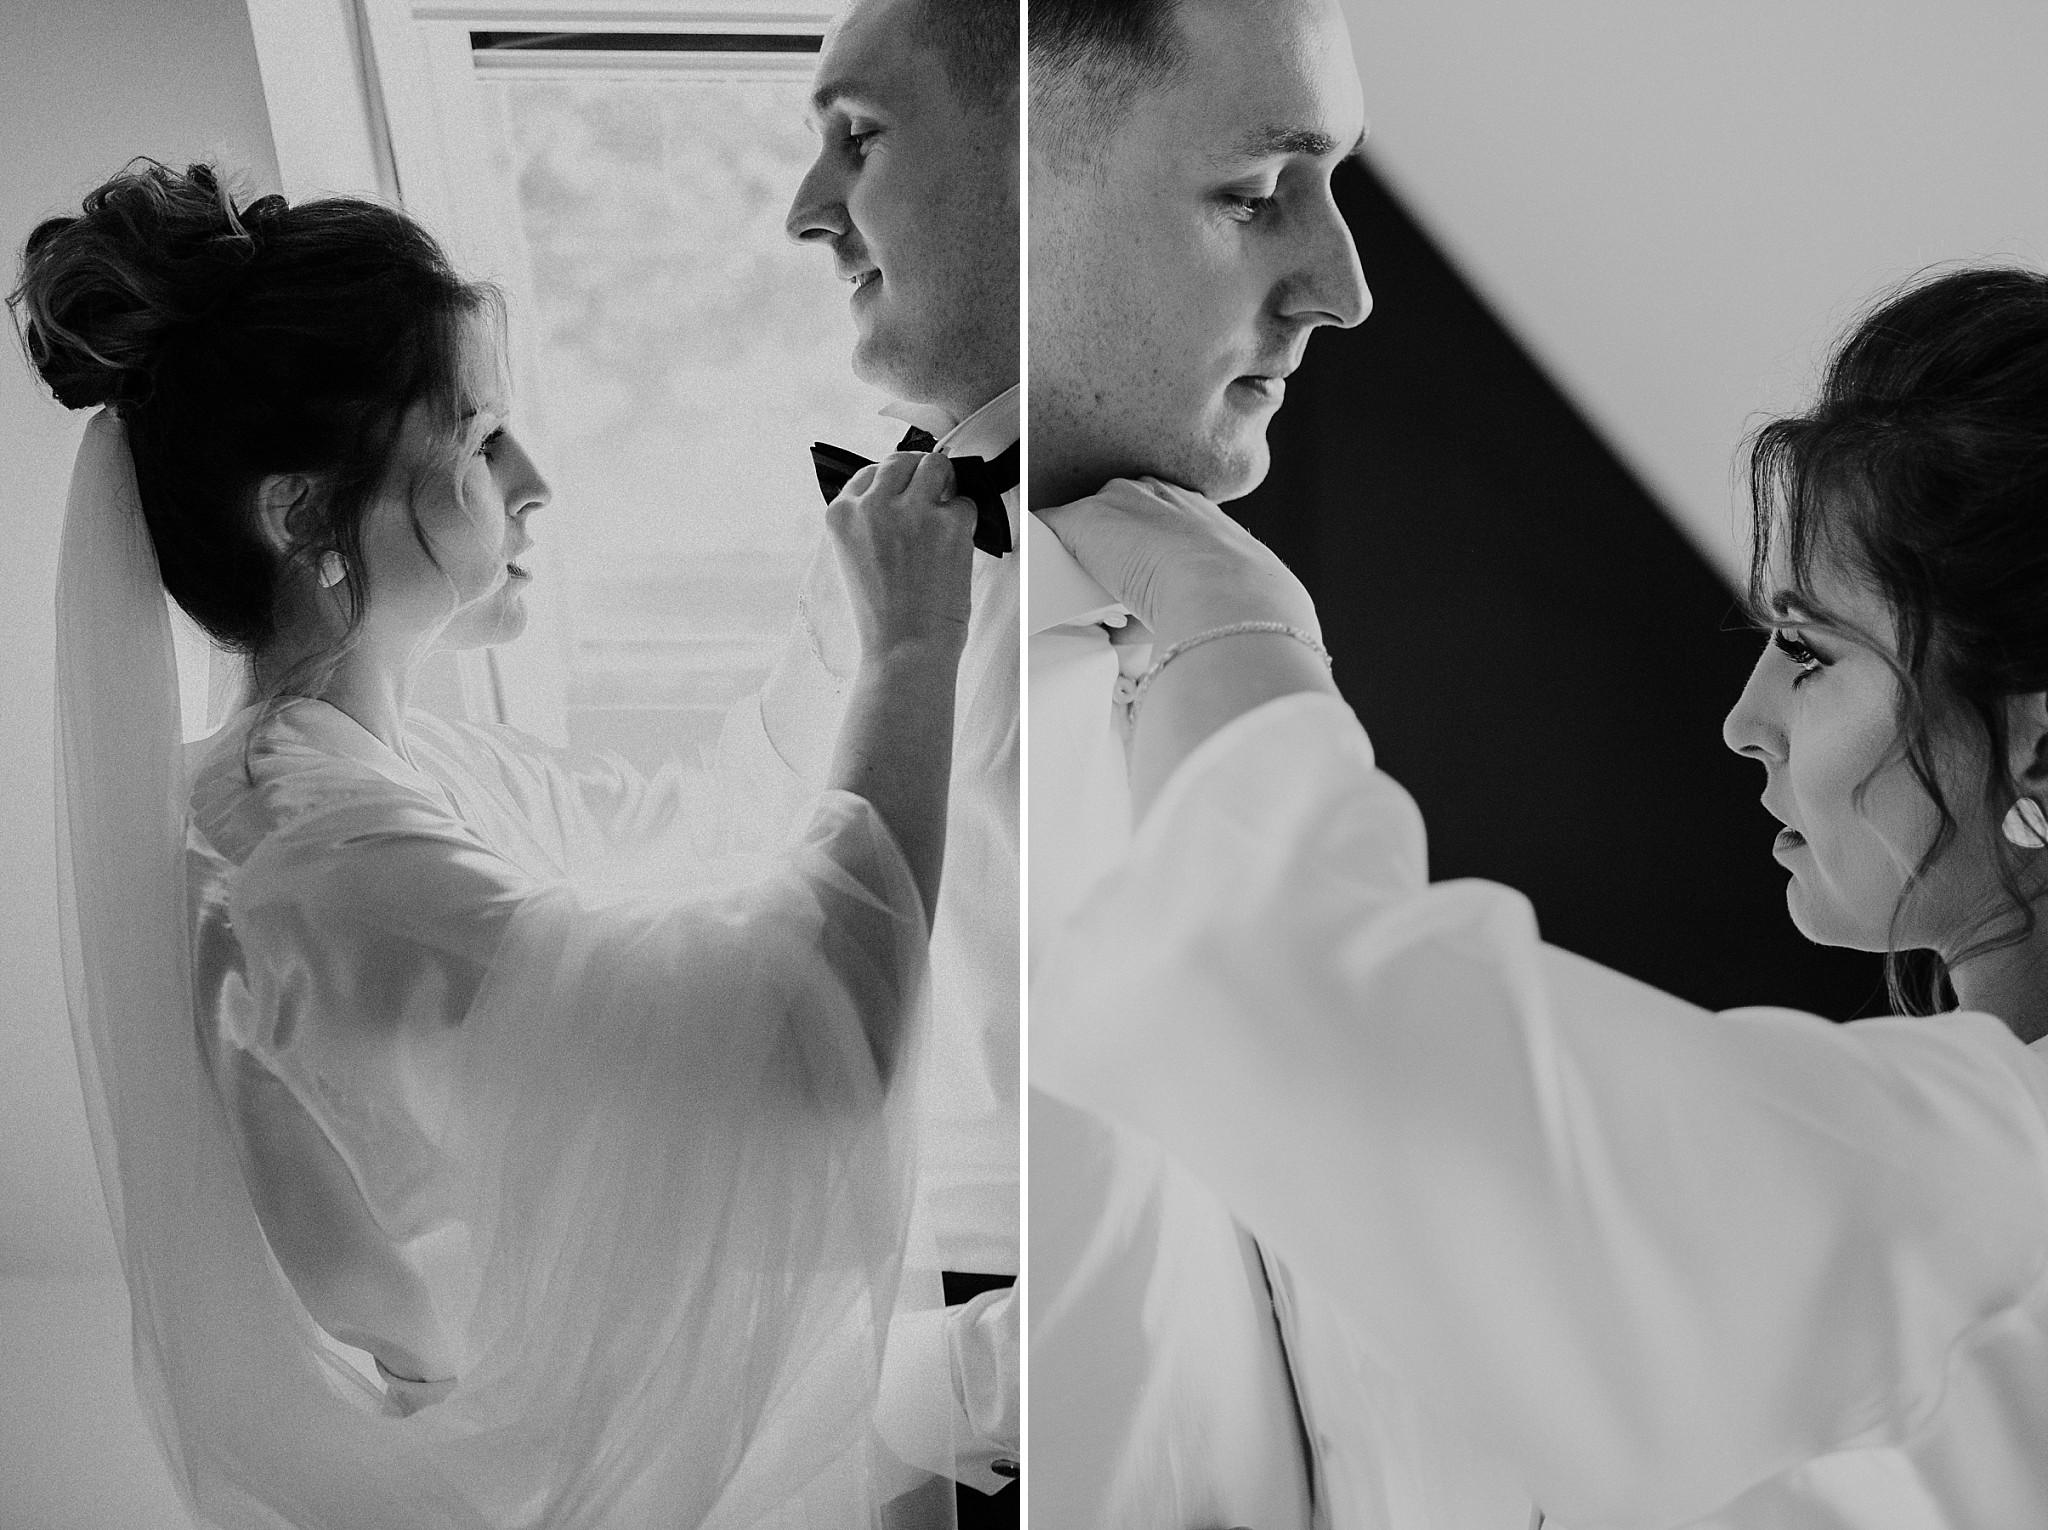 fotograf poznan wesele dobra truskawka piekne wesele pod poznaniem wesele w dobrej truskawce piekna para mloda slub marzen slub koronawirus slub listopad wesele koronawirus 047